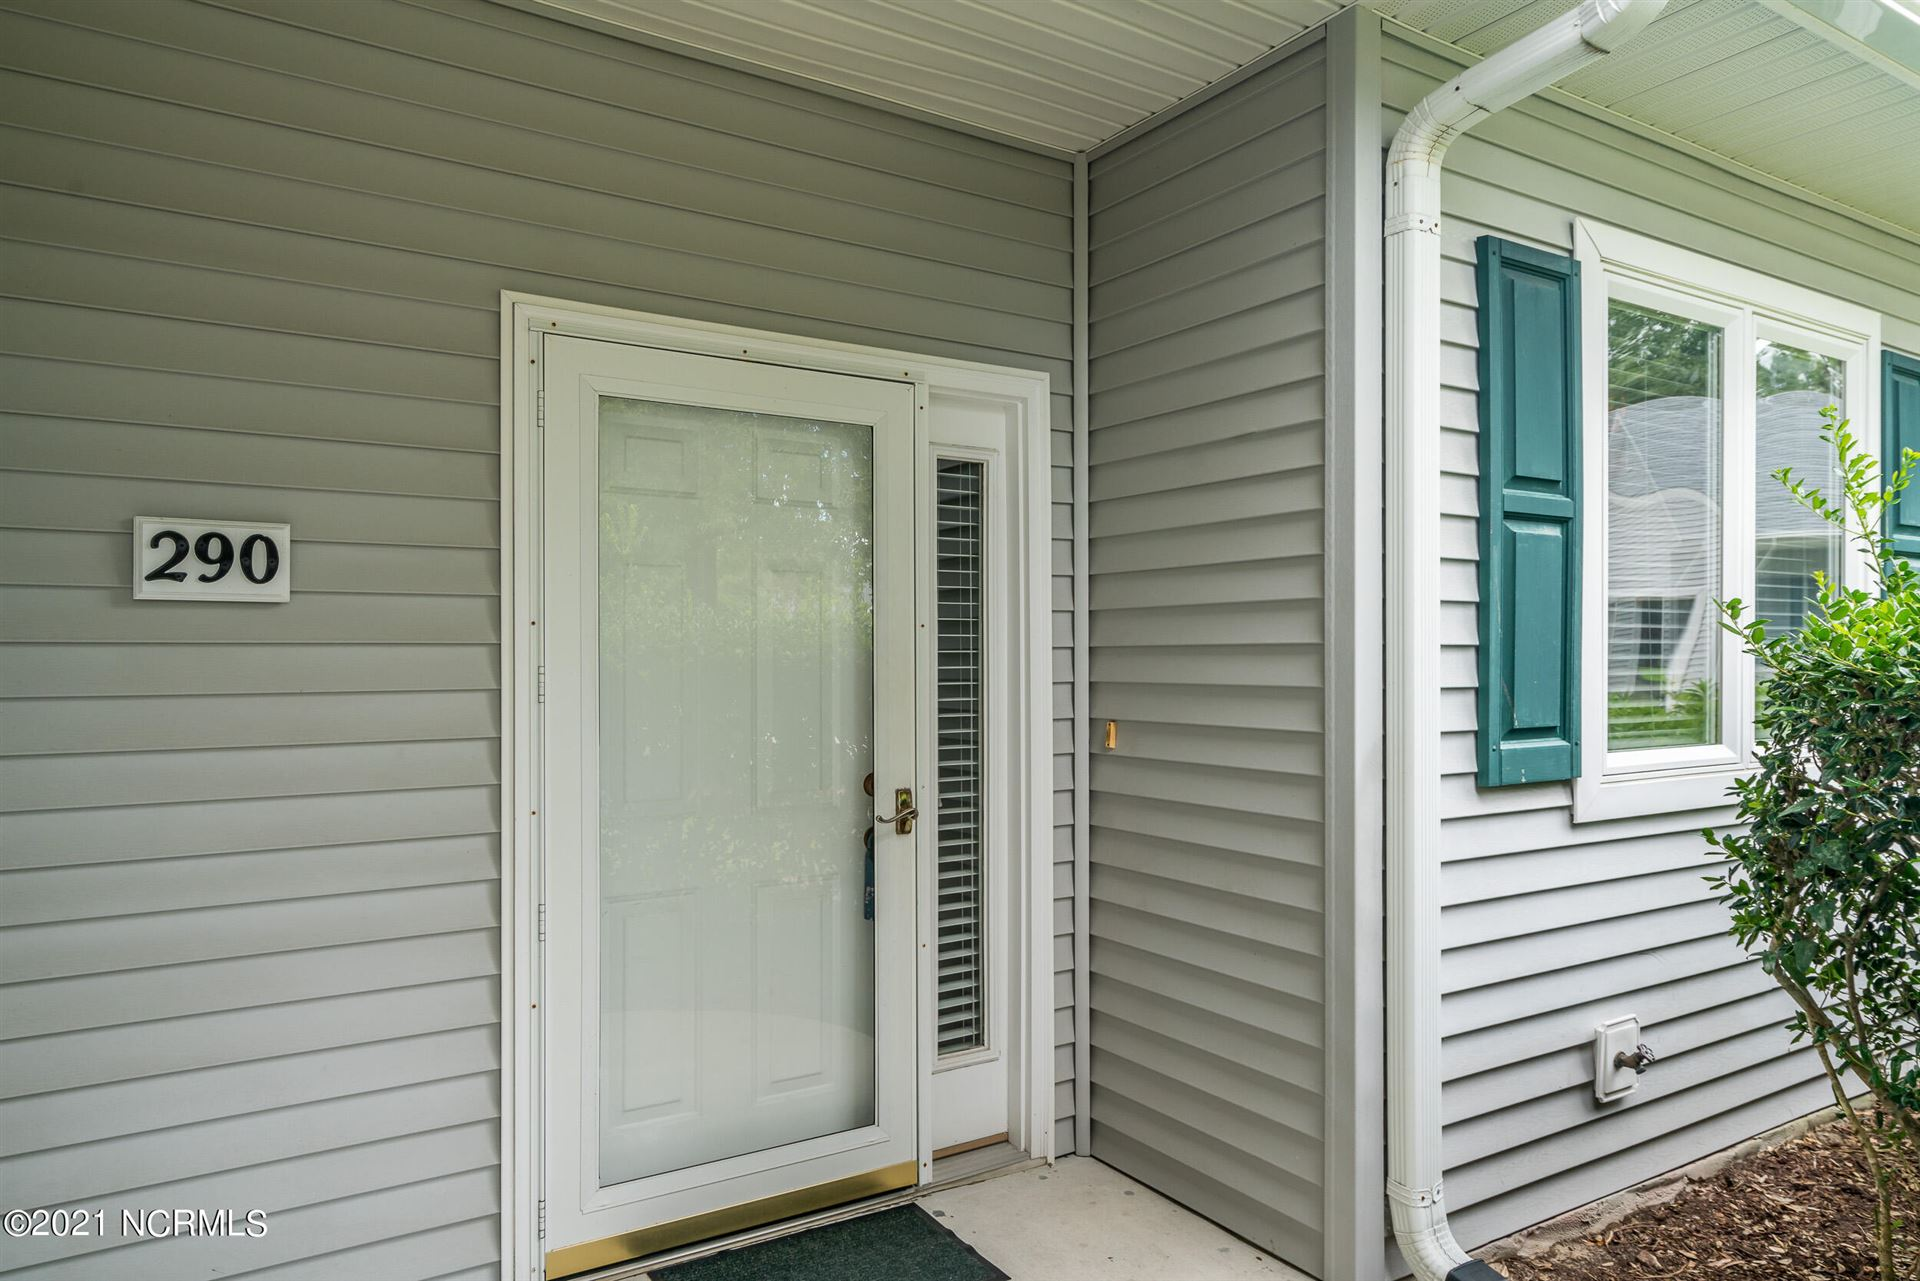 Photo of 290 Bonnet Way SE, Southport, NC 28461 (MLS # 100291117)